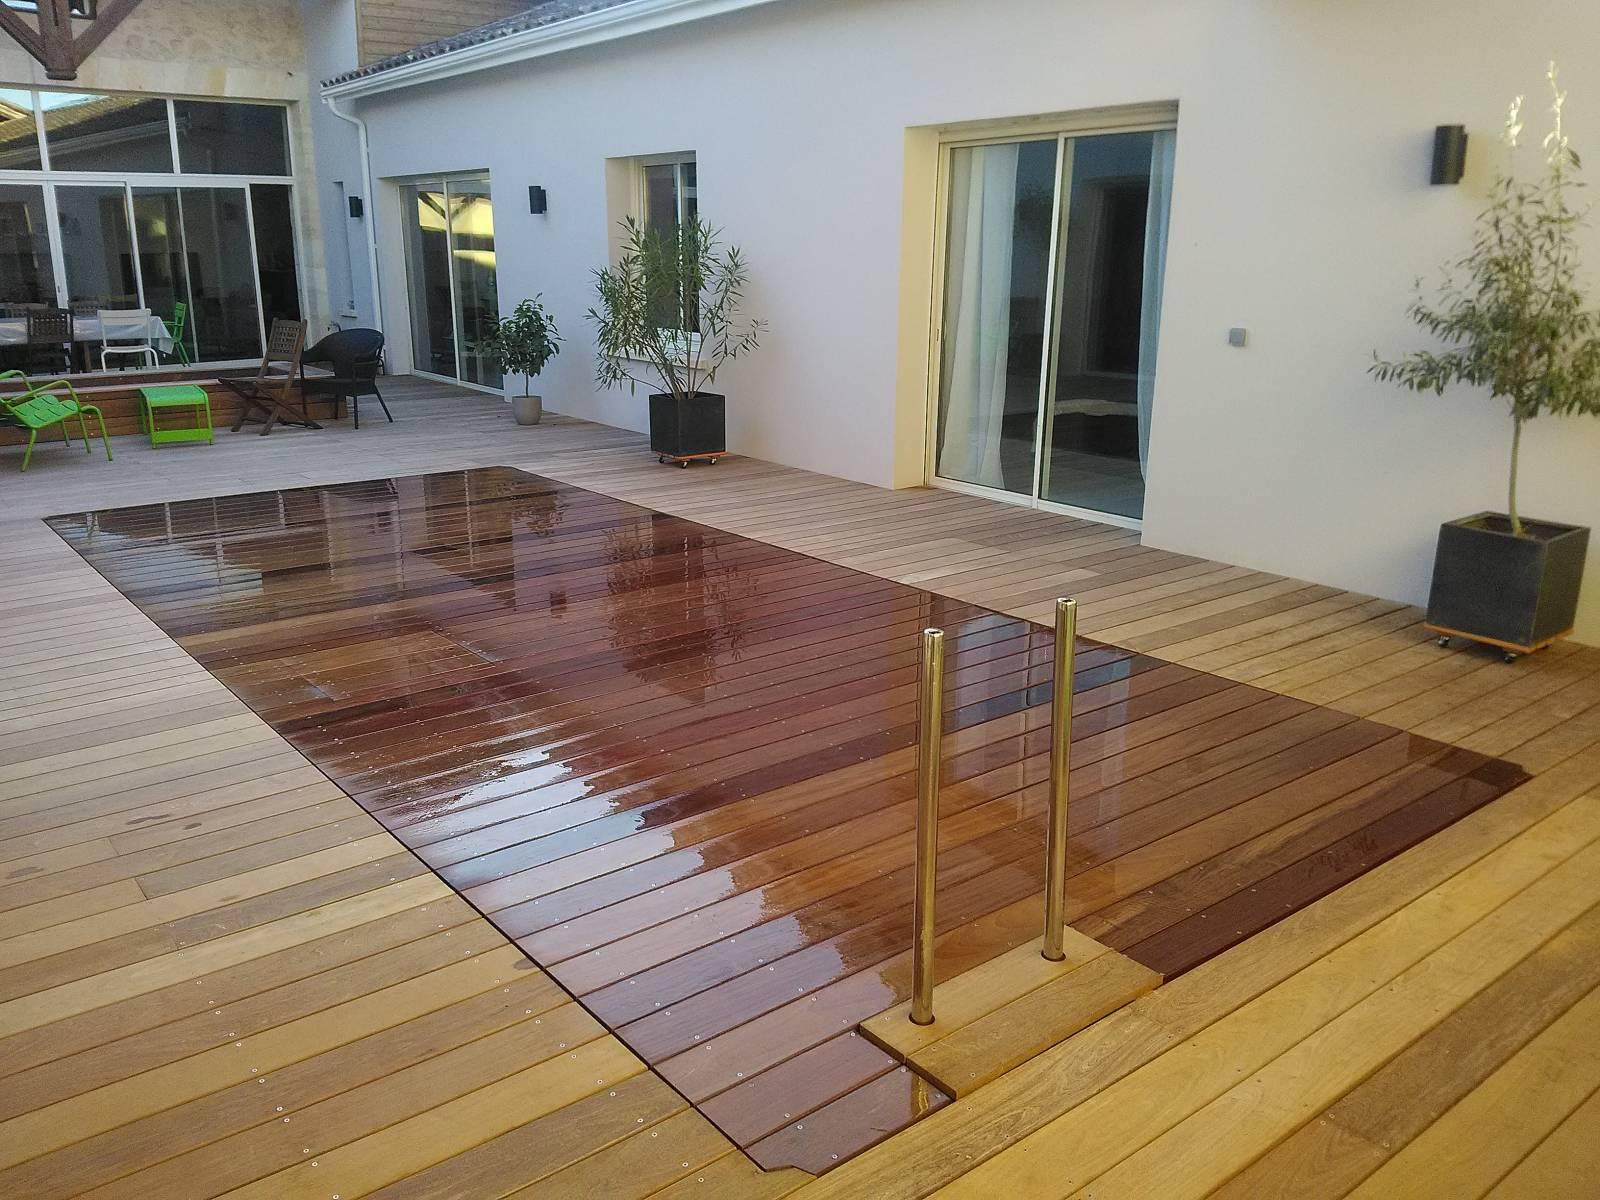 amphibia le fond mobile de piscine o terrasse de piscine. Black Bedroom Furniture Sets. Home Design Ideas